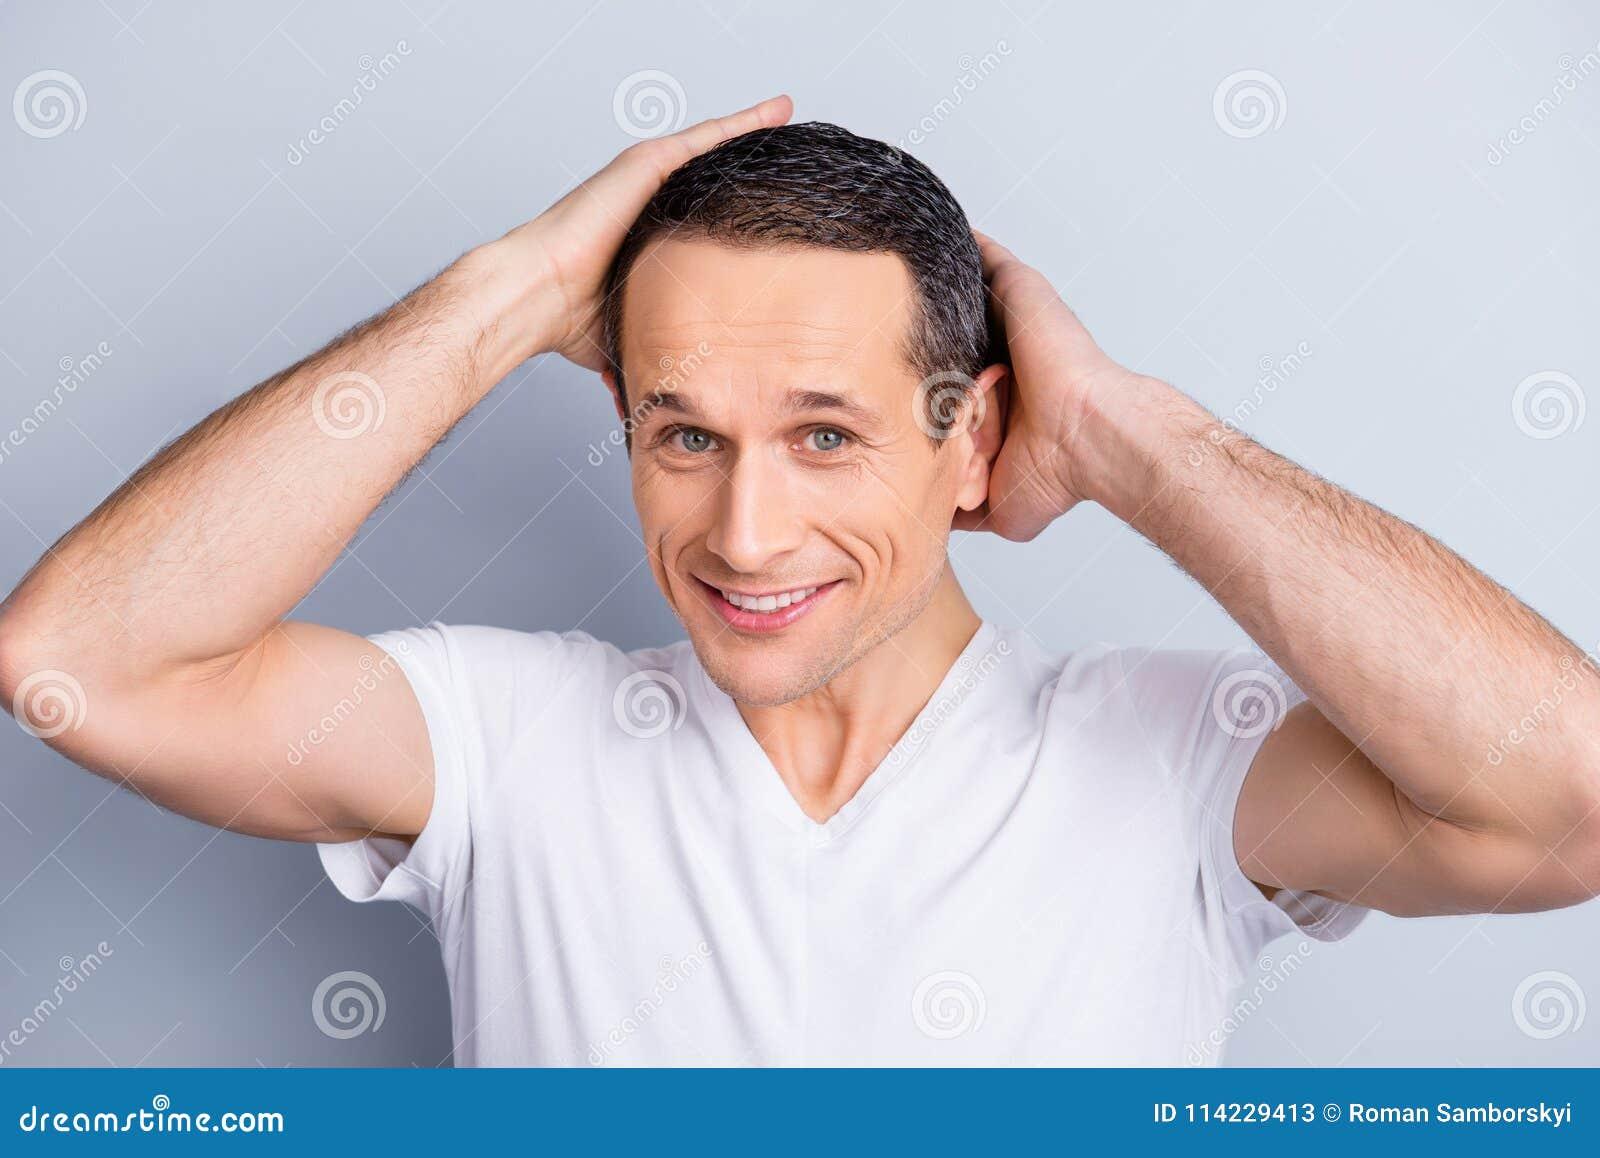 Portrait of shaven, experienced, neat, trendy, brunet, positive